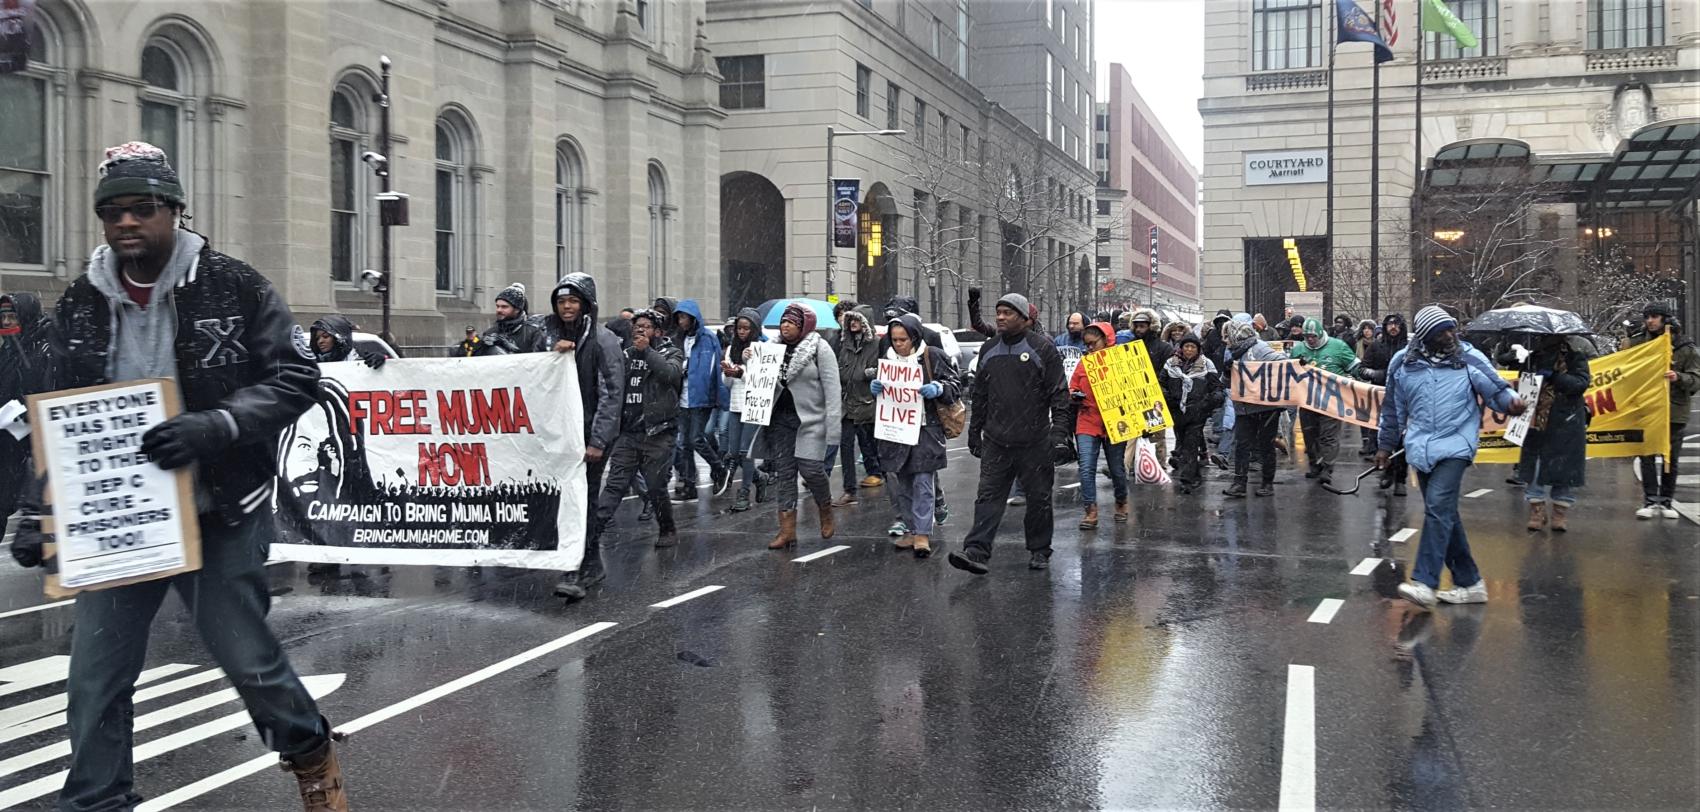 Photo of Philadelphia action demands freedom for Abu-Jamal now!